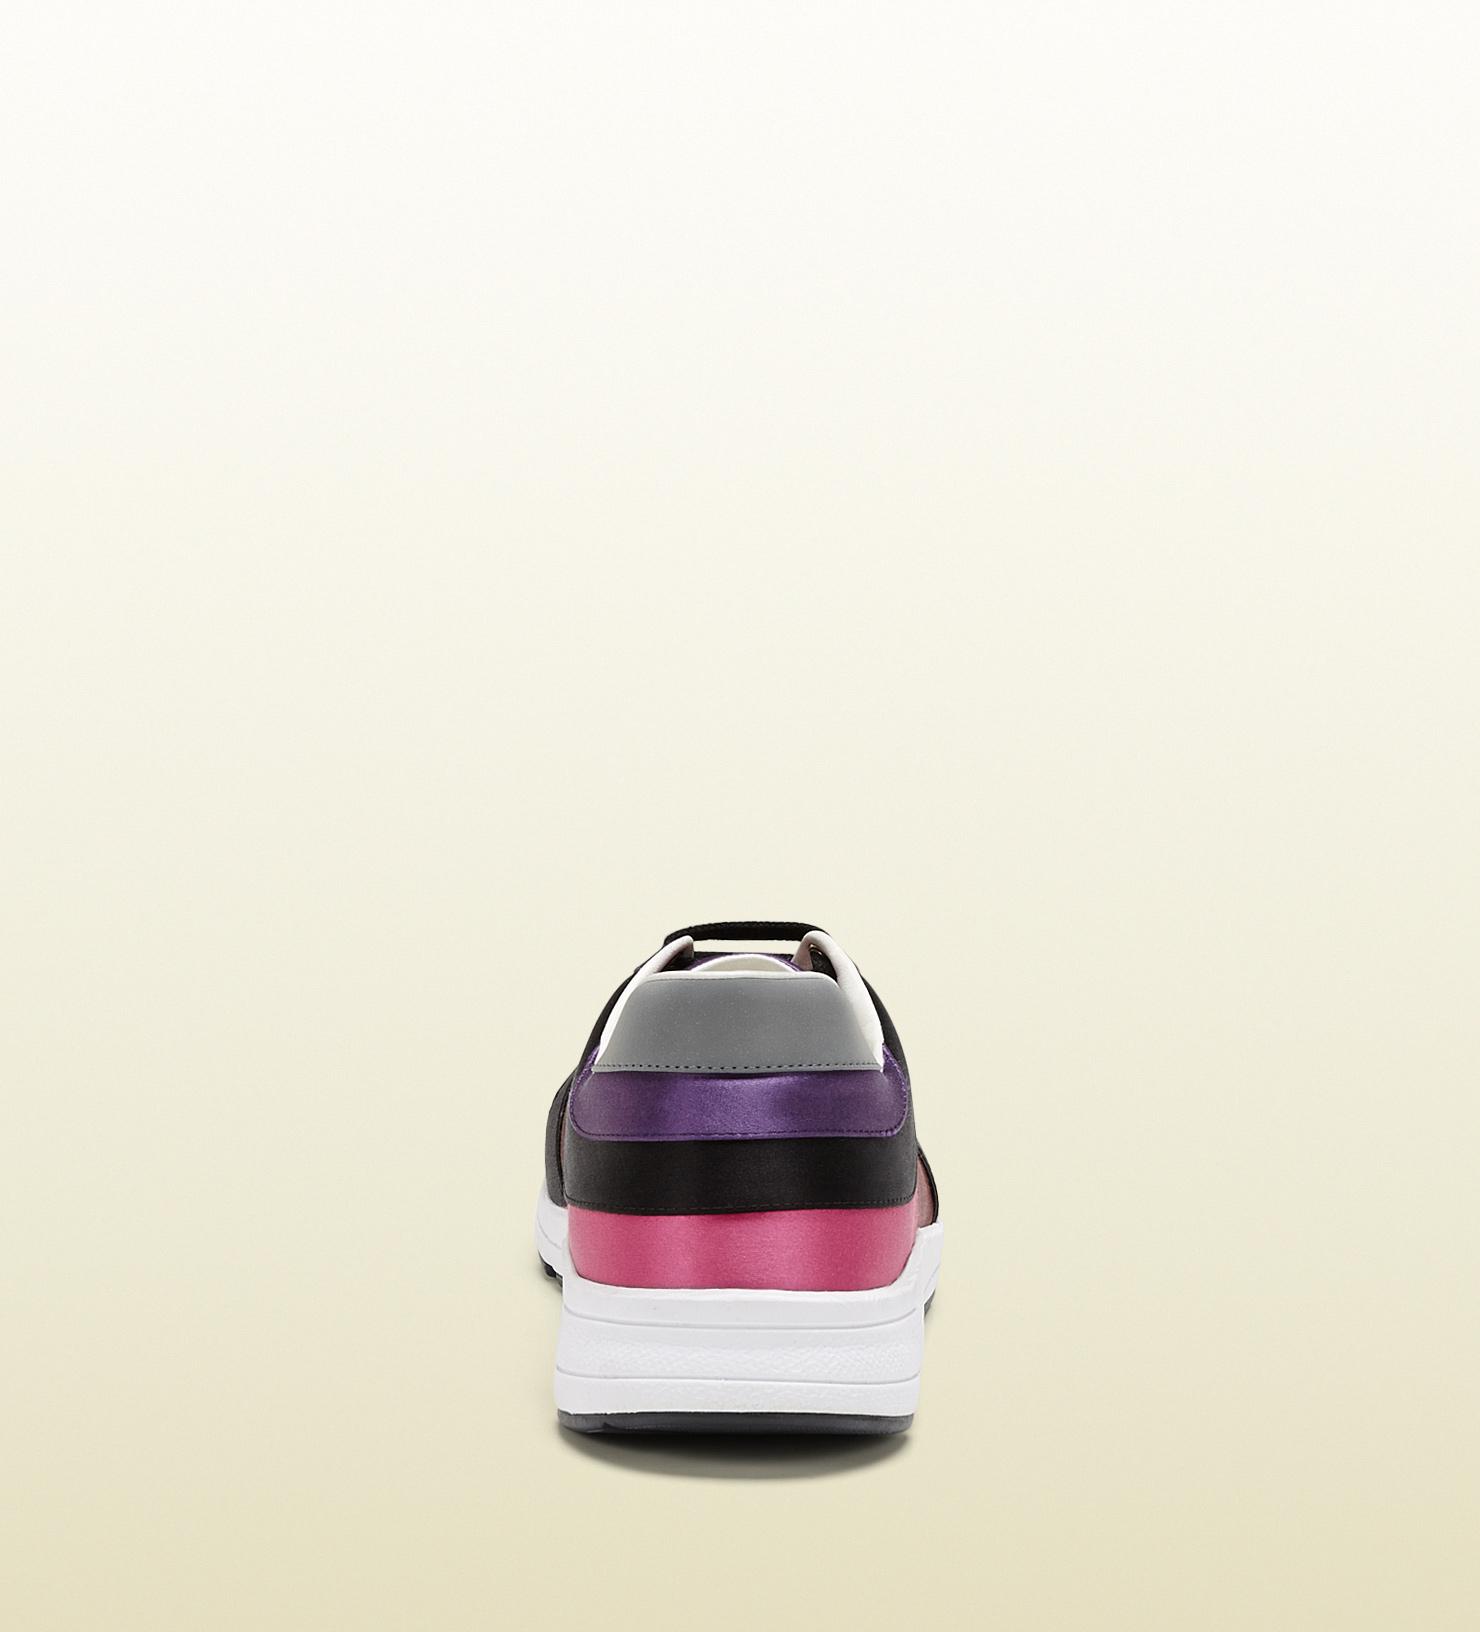 df1a098d4 Gucci Multicolor Satin Lace-up Sneaker in Purple for Men - Lyst